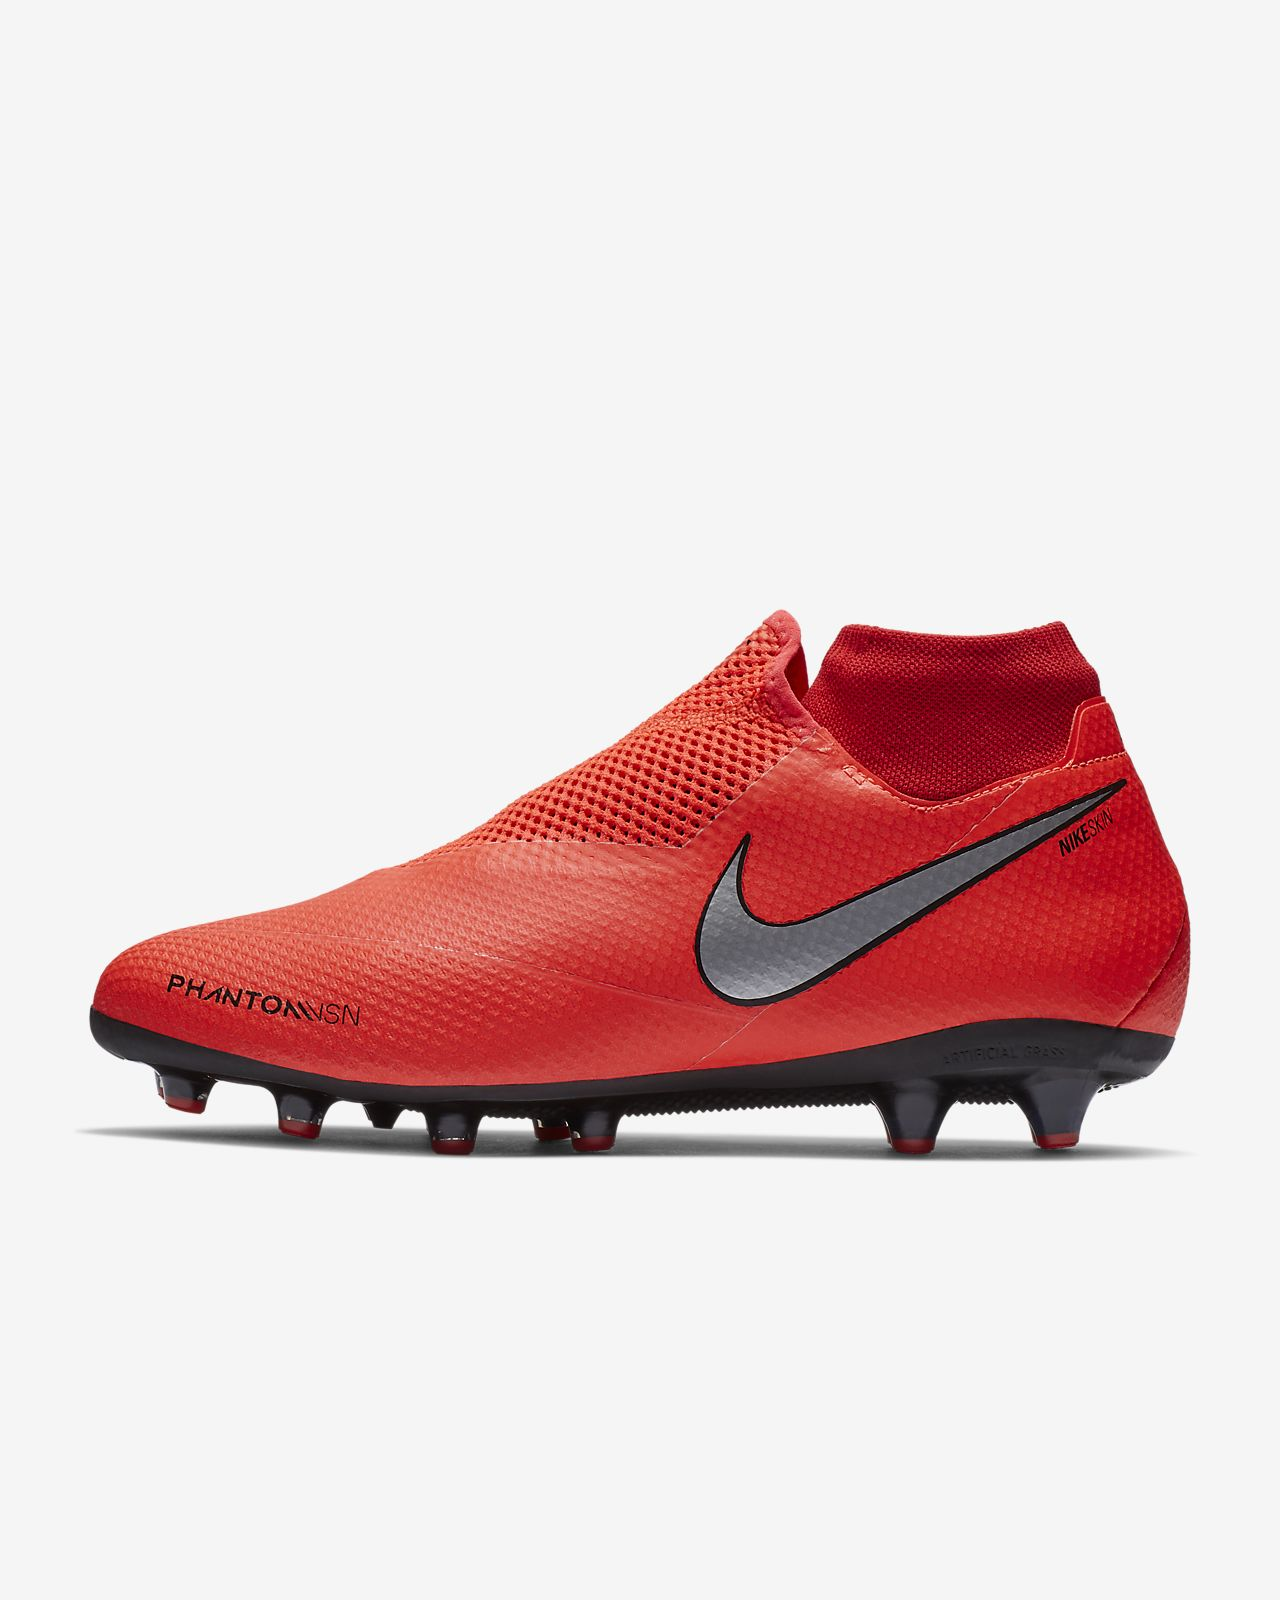 ... Calzado de fútbol para pasto artificial Nike Phantom Vision Pro Dynamic  Fit AG-PRO 78fb6c76481b8